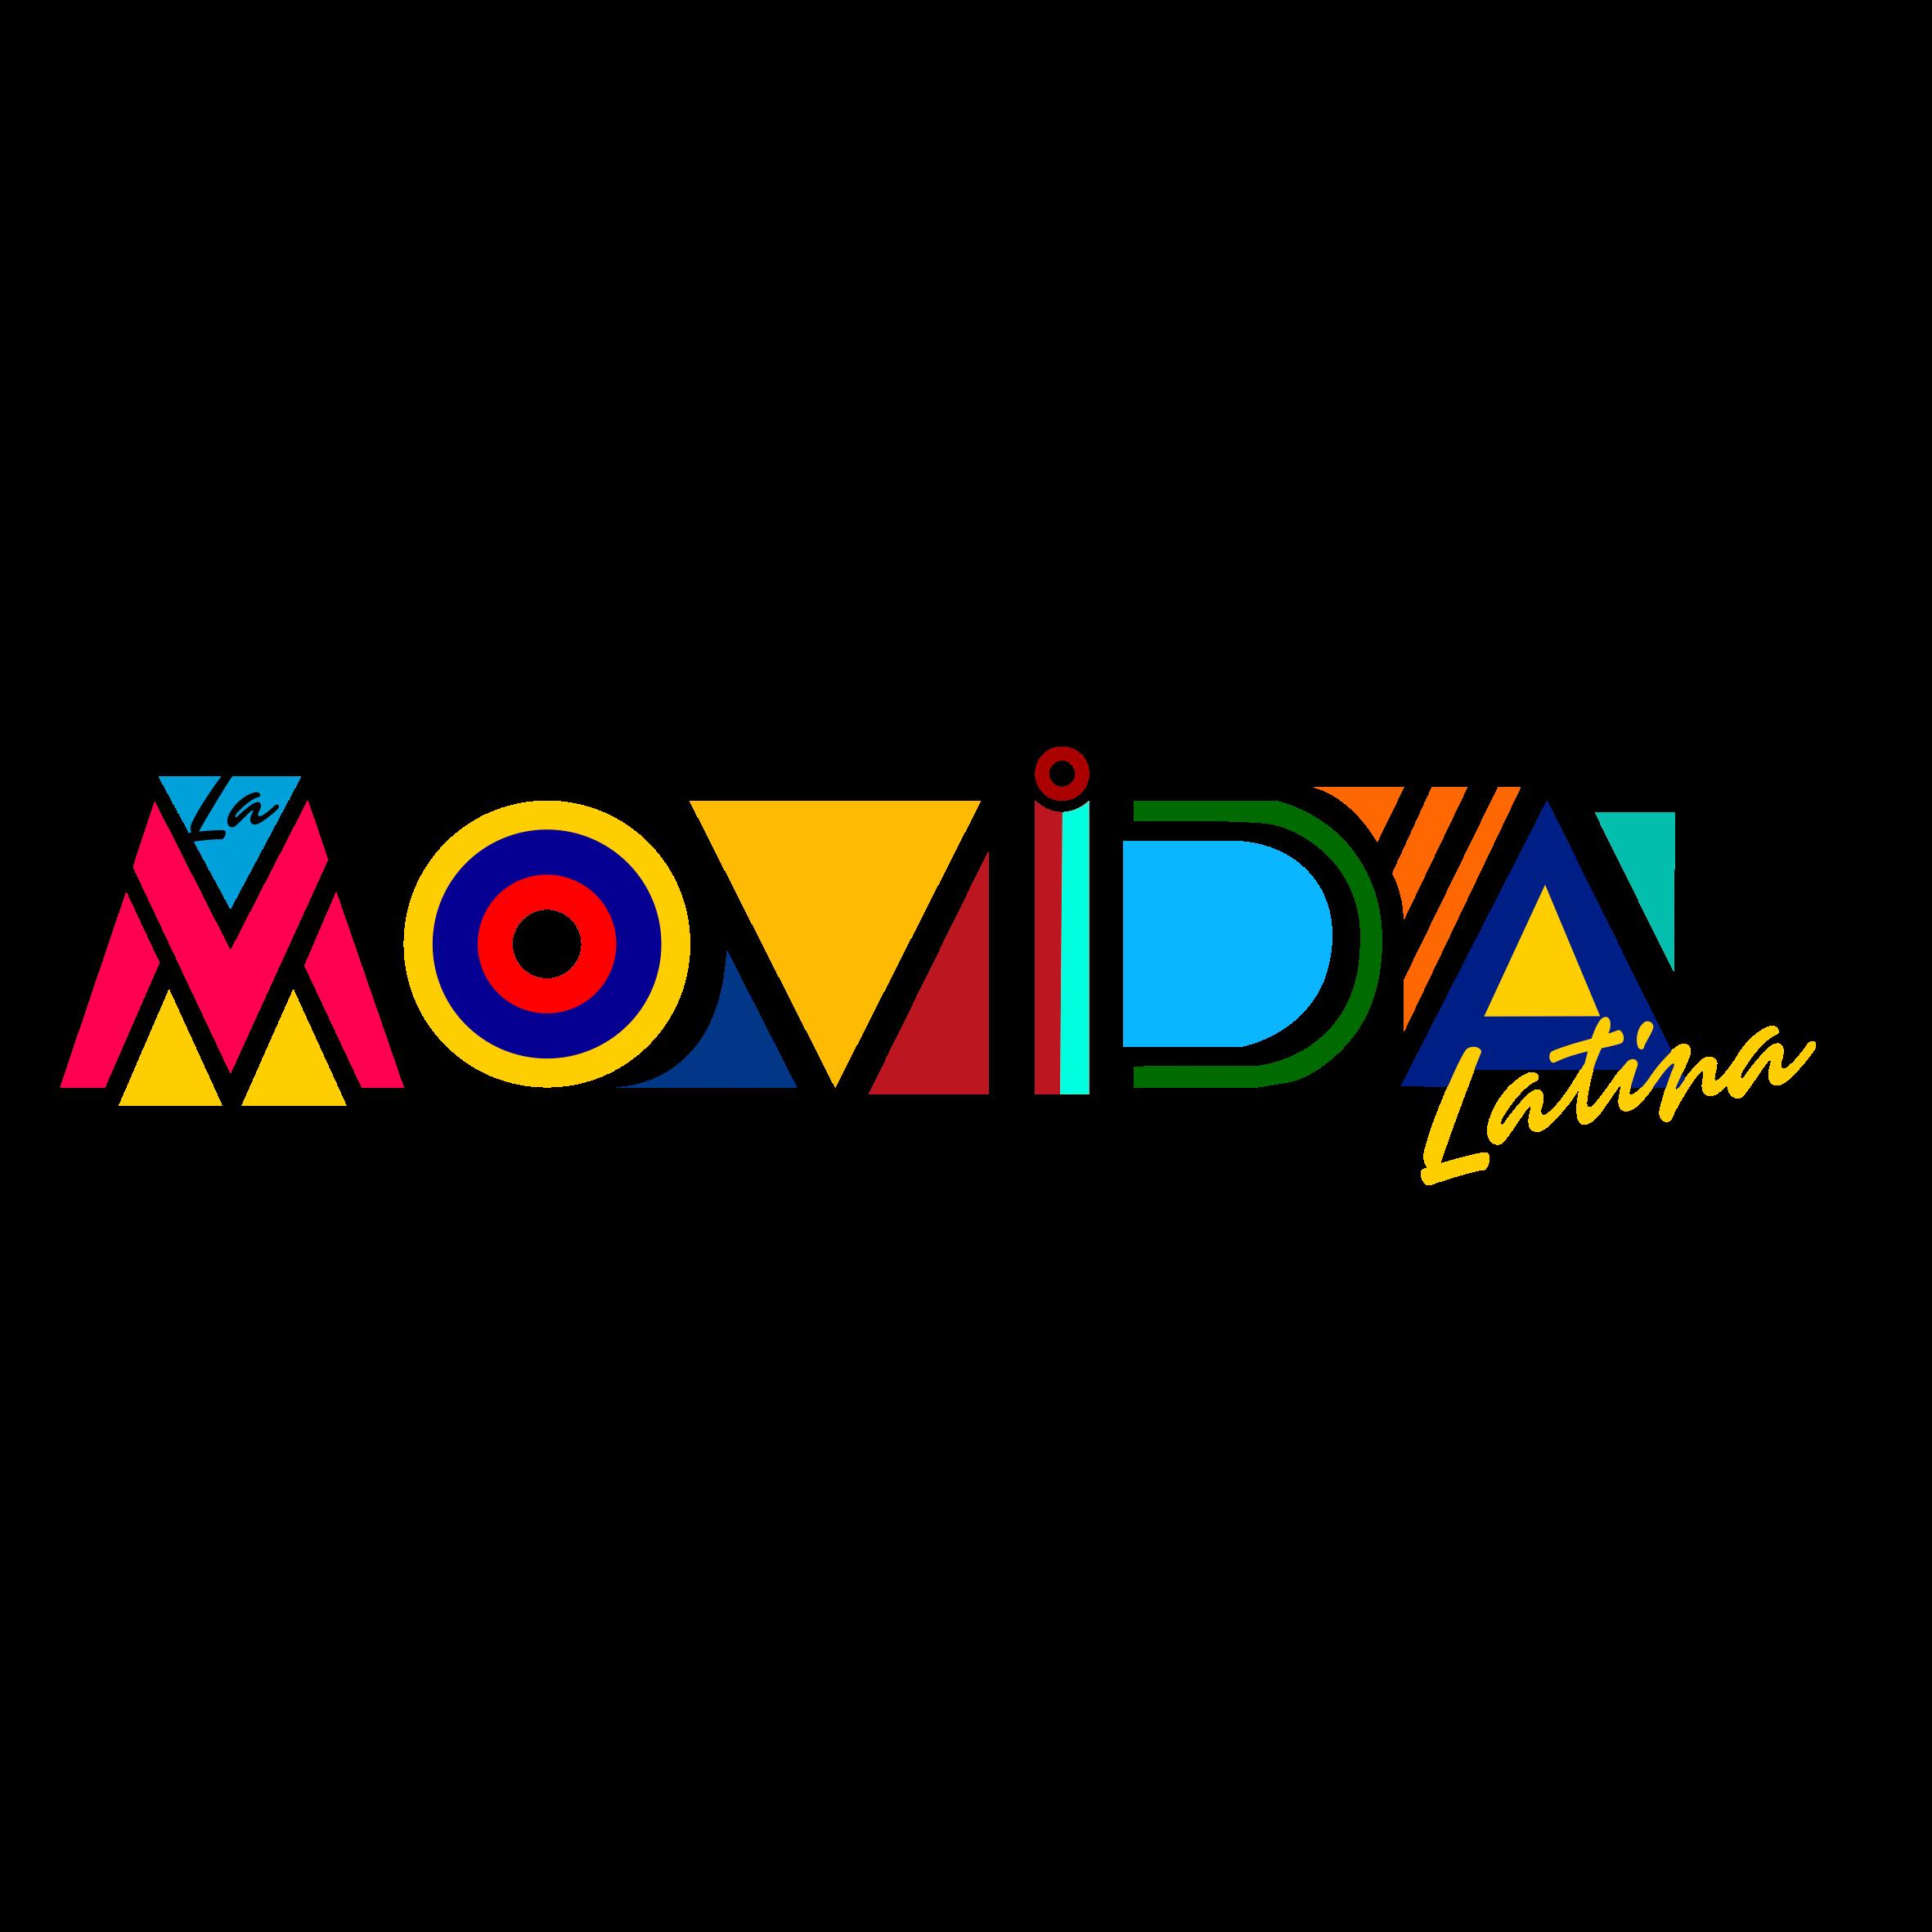 La movida Latina